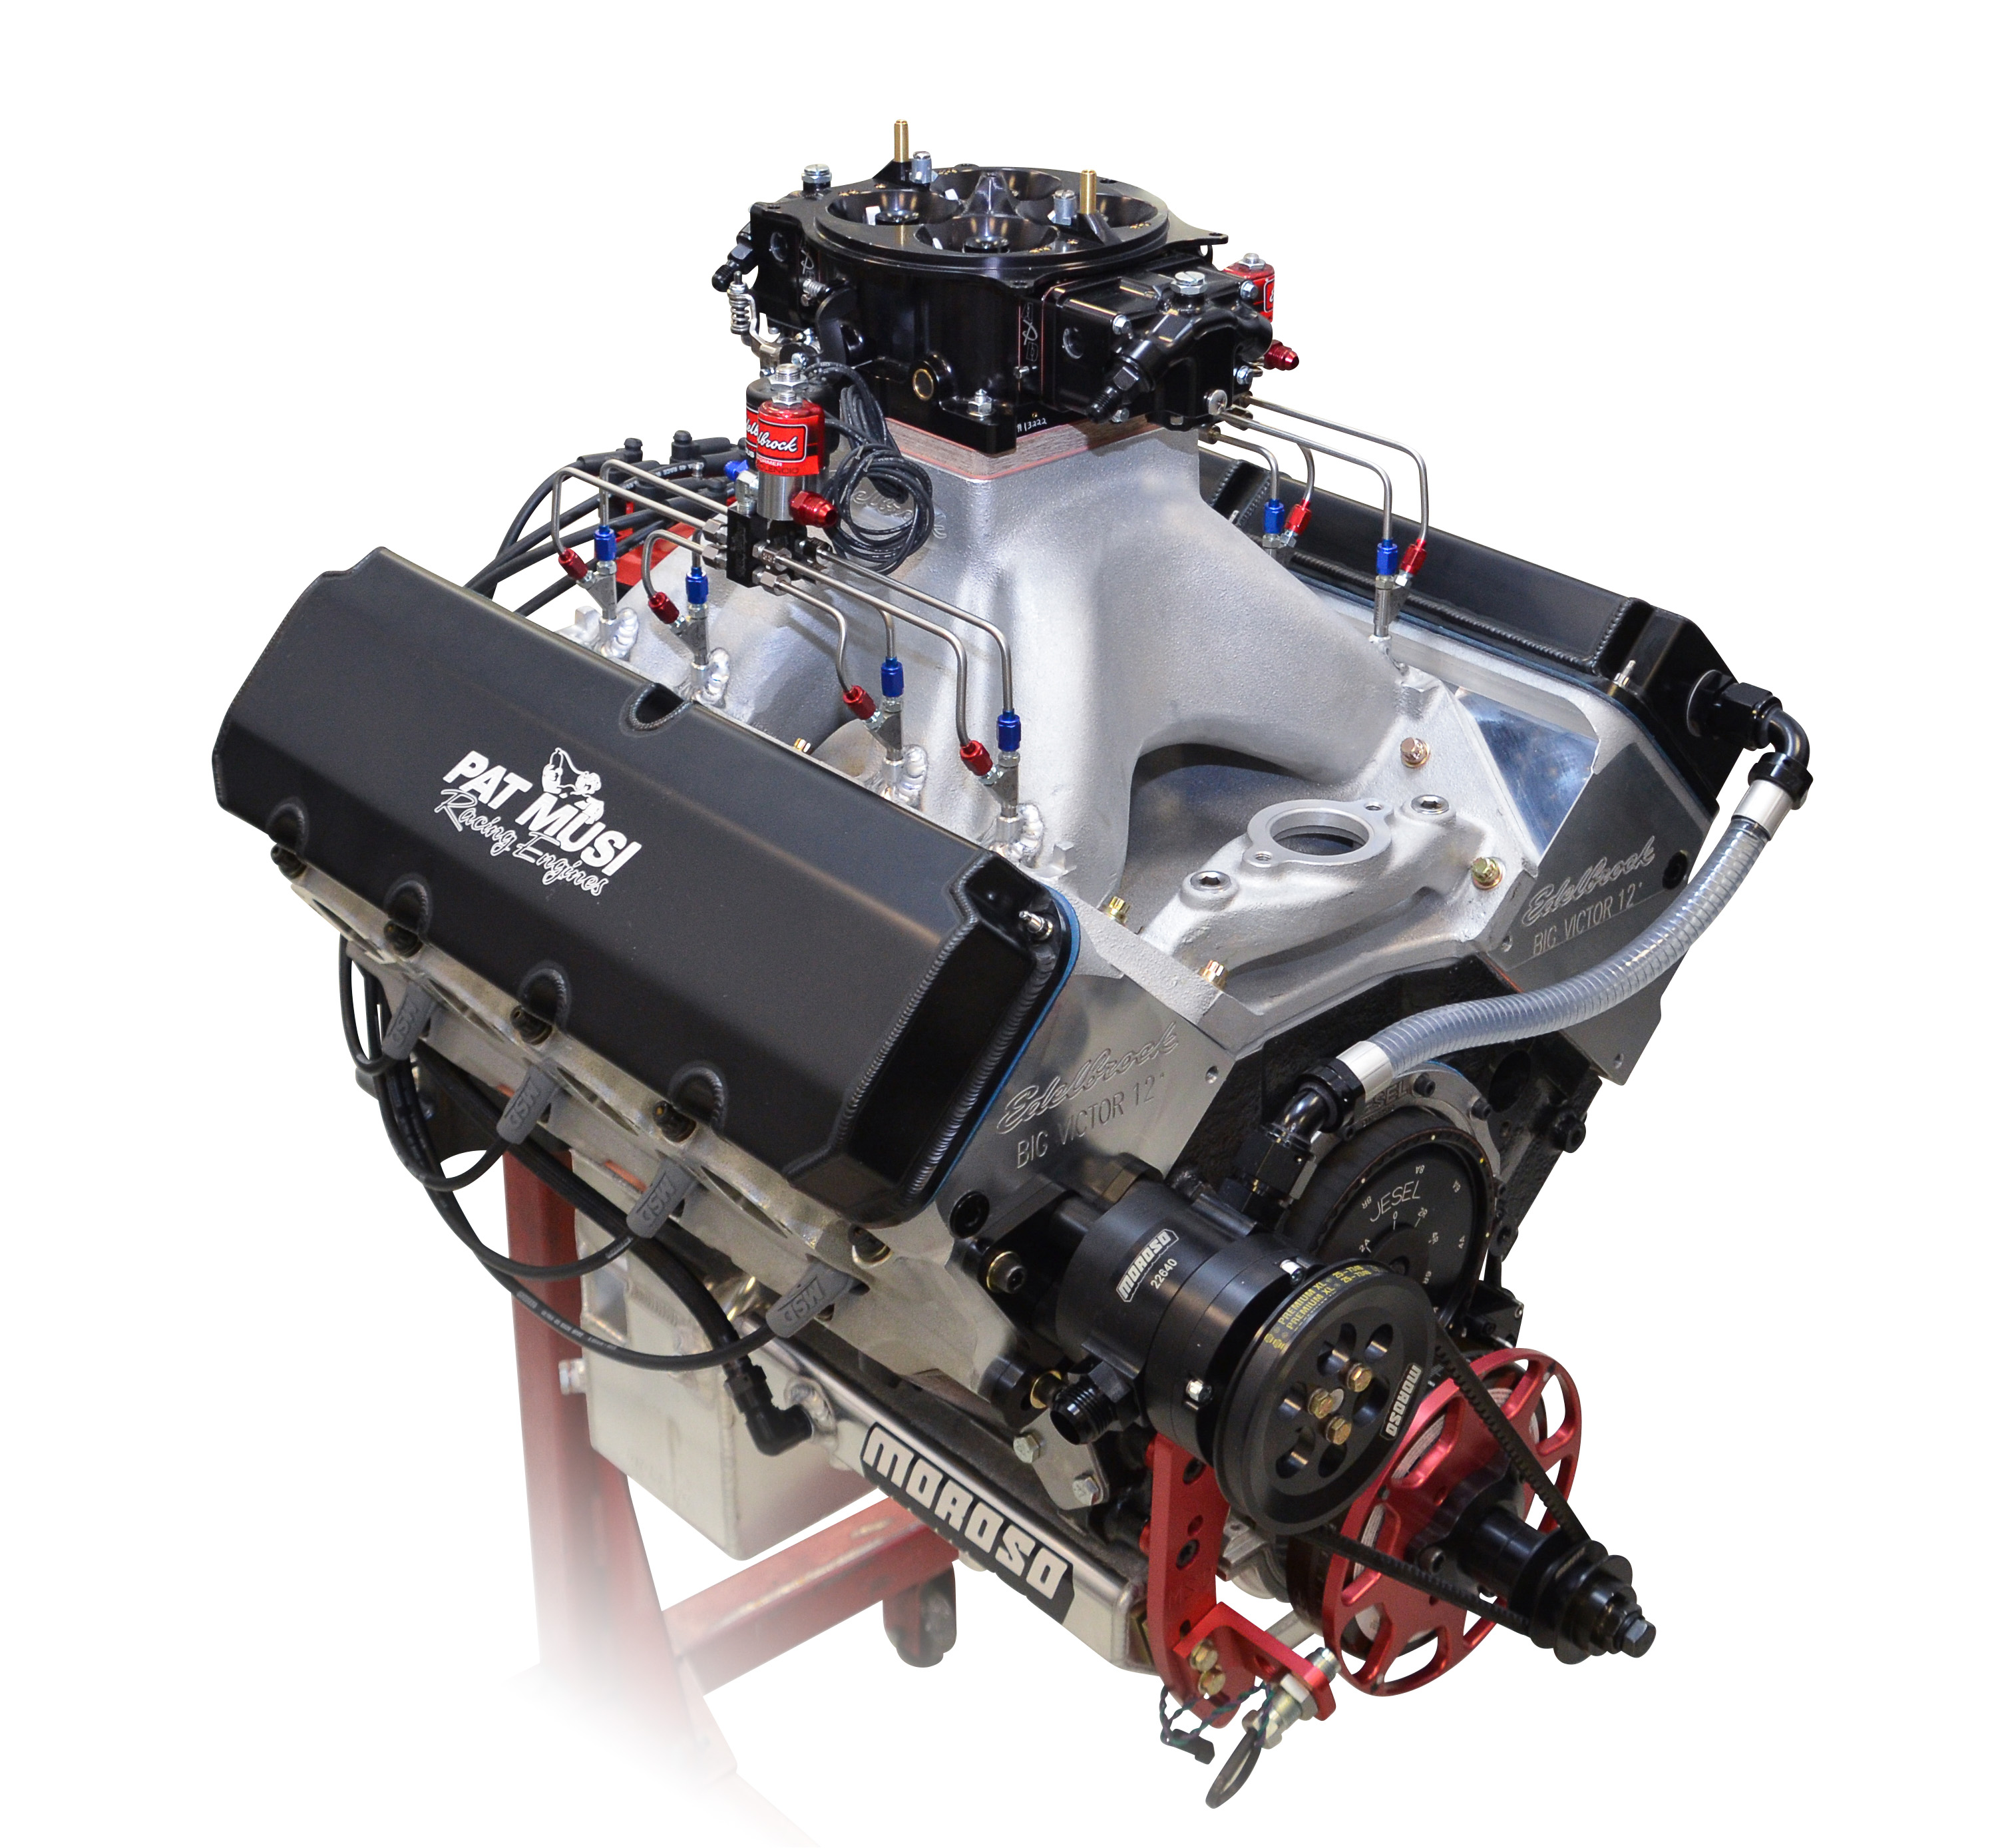 PRI 2018: Edelbrock and Pat Musi Team Up On 1,650hp Nitrous 632 Crate Motor For Sportsman Drag Racing